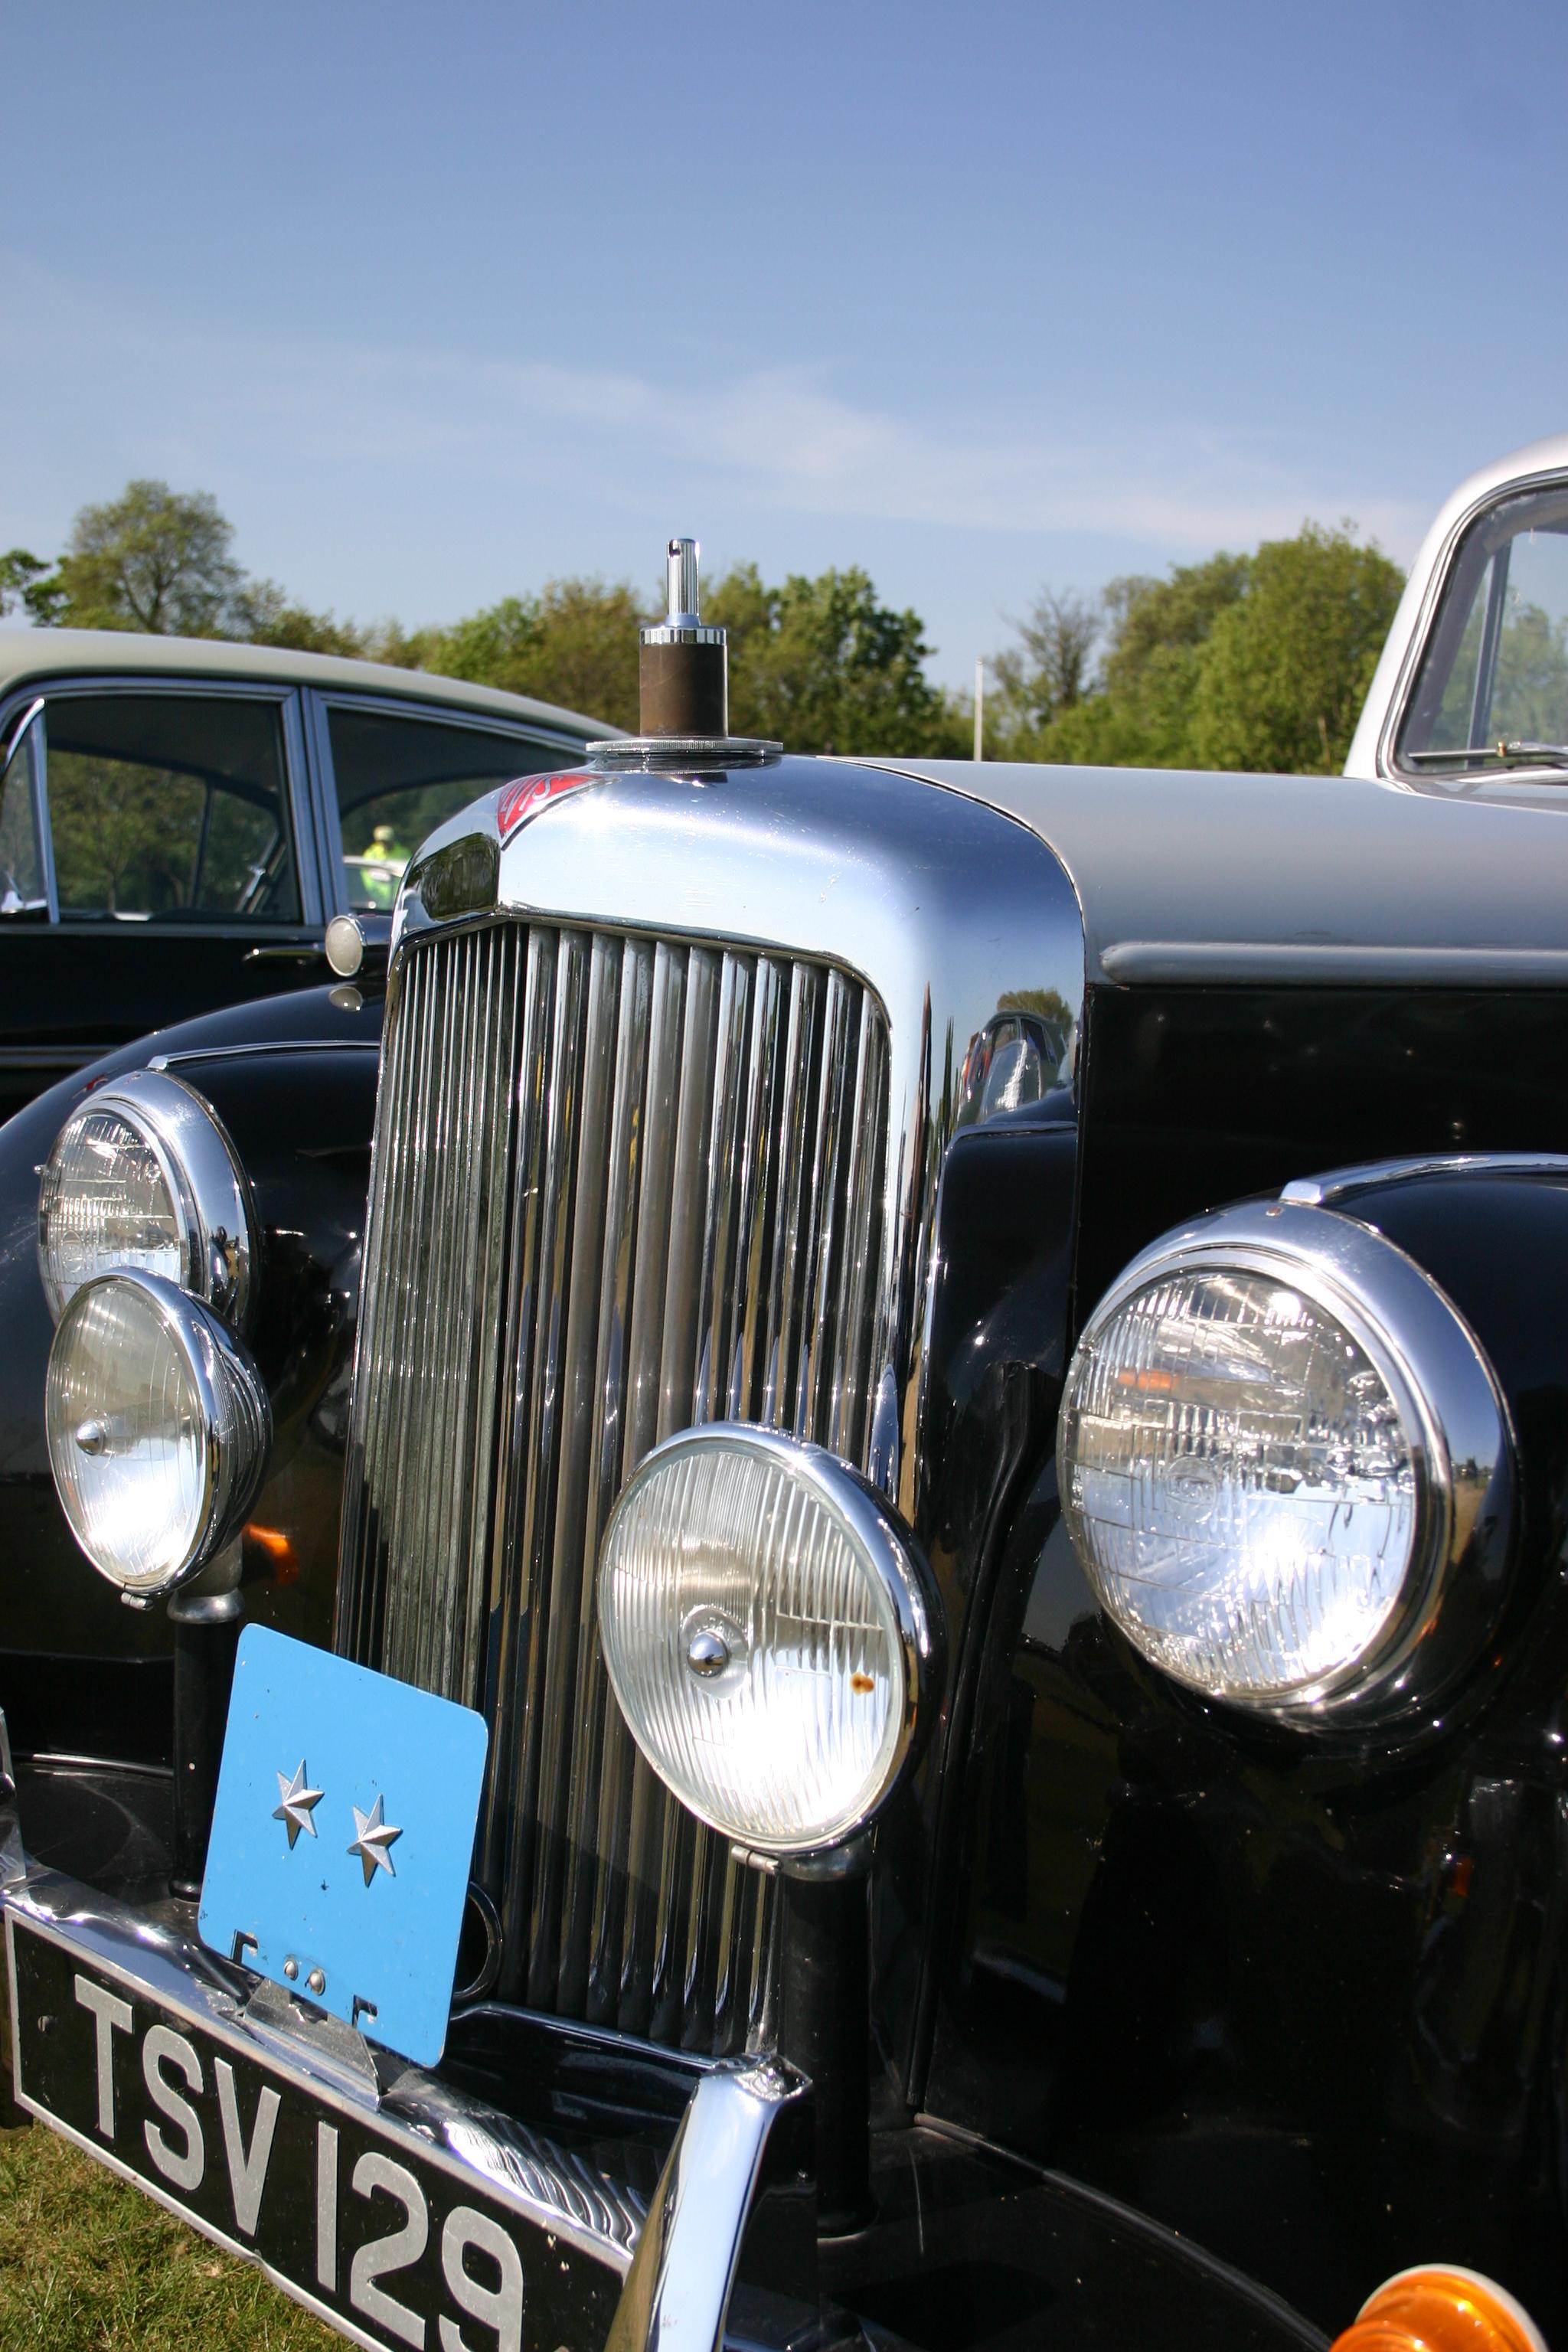 ALVIS DUXFORD SPRING CAR SHOW by Sceptre63